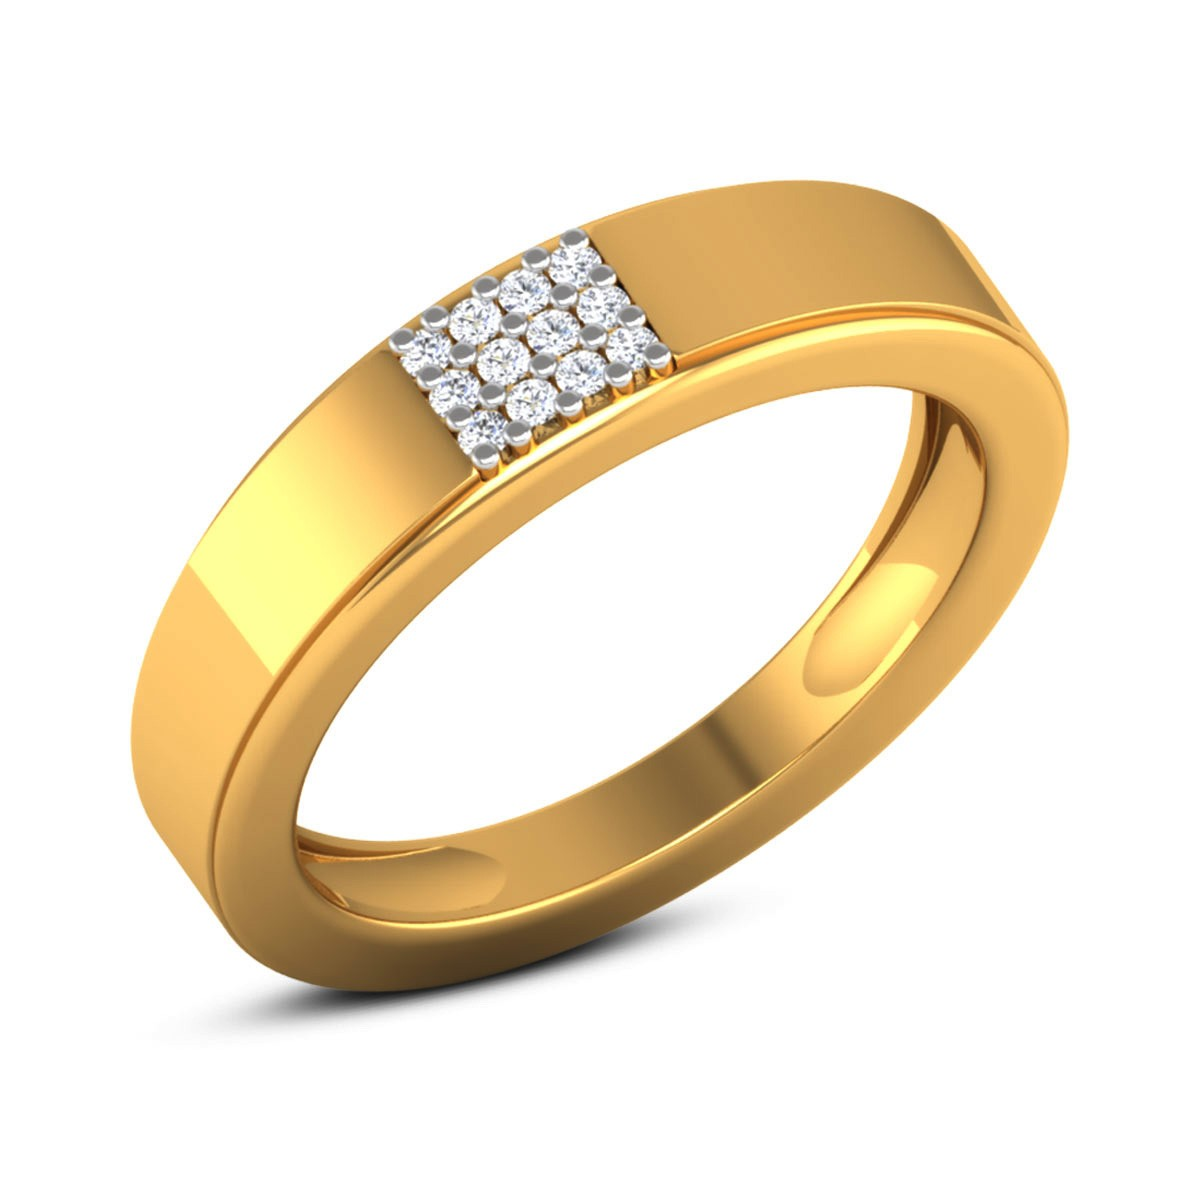 Aahlaad Diamond Band Ring